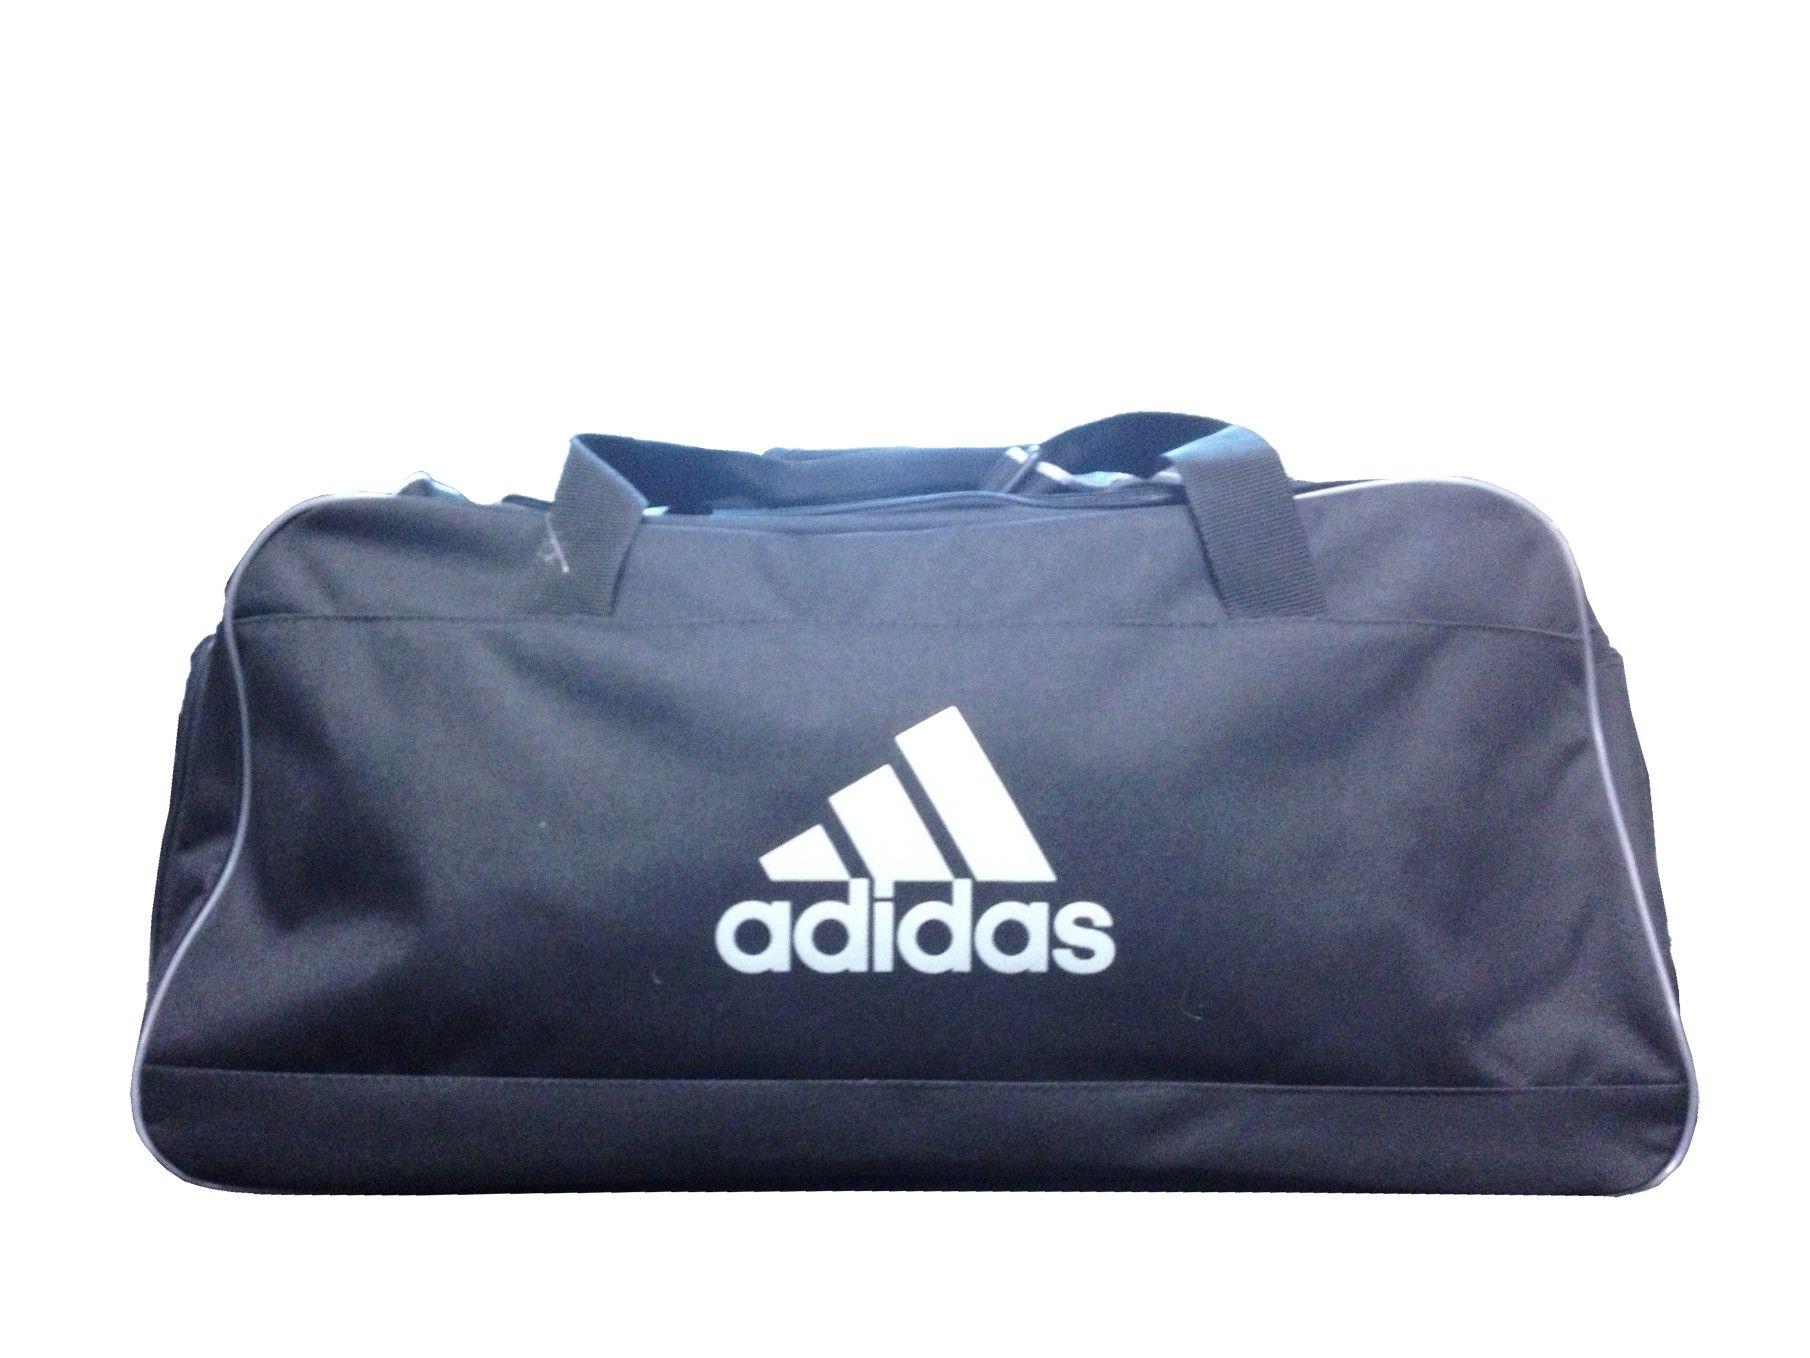 Adidas Bolsa M Ref Deporte Sereno v42882negra GrisTalla rxBodeC